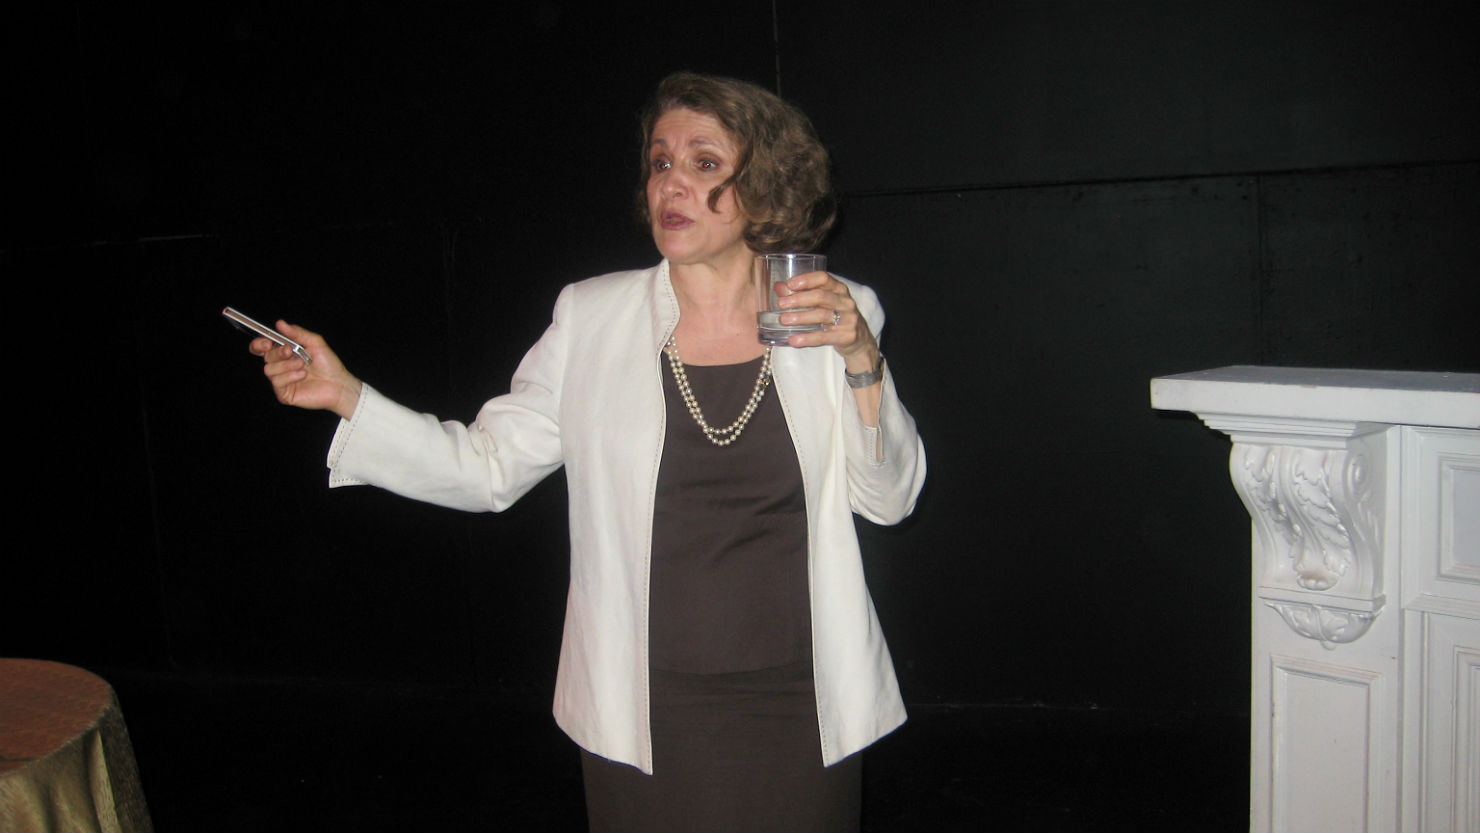 FAR NORTH,Gallery Players Black Box Festival, NYC.(Mary Leggio; dir. Norma Medina)